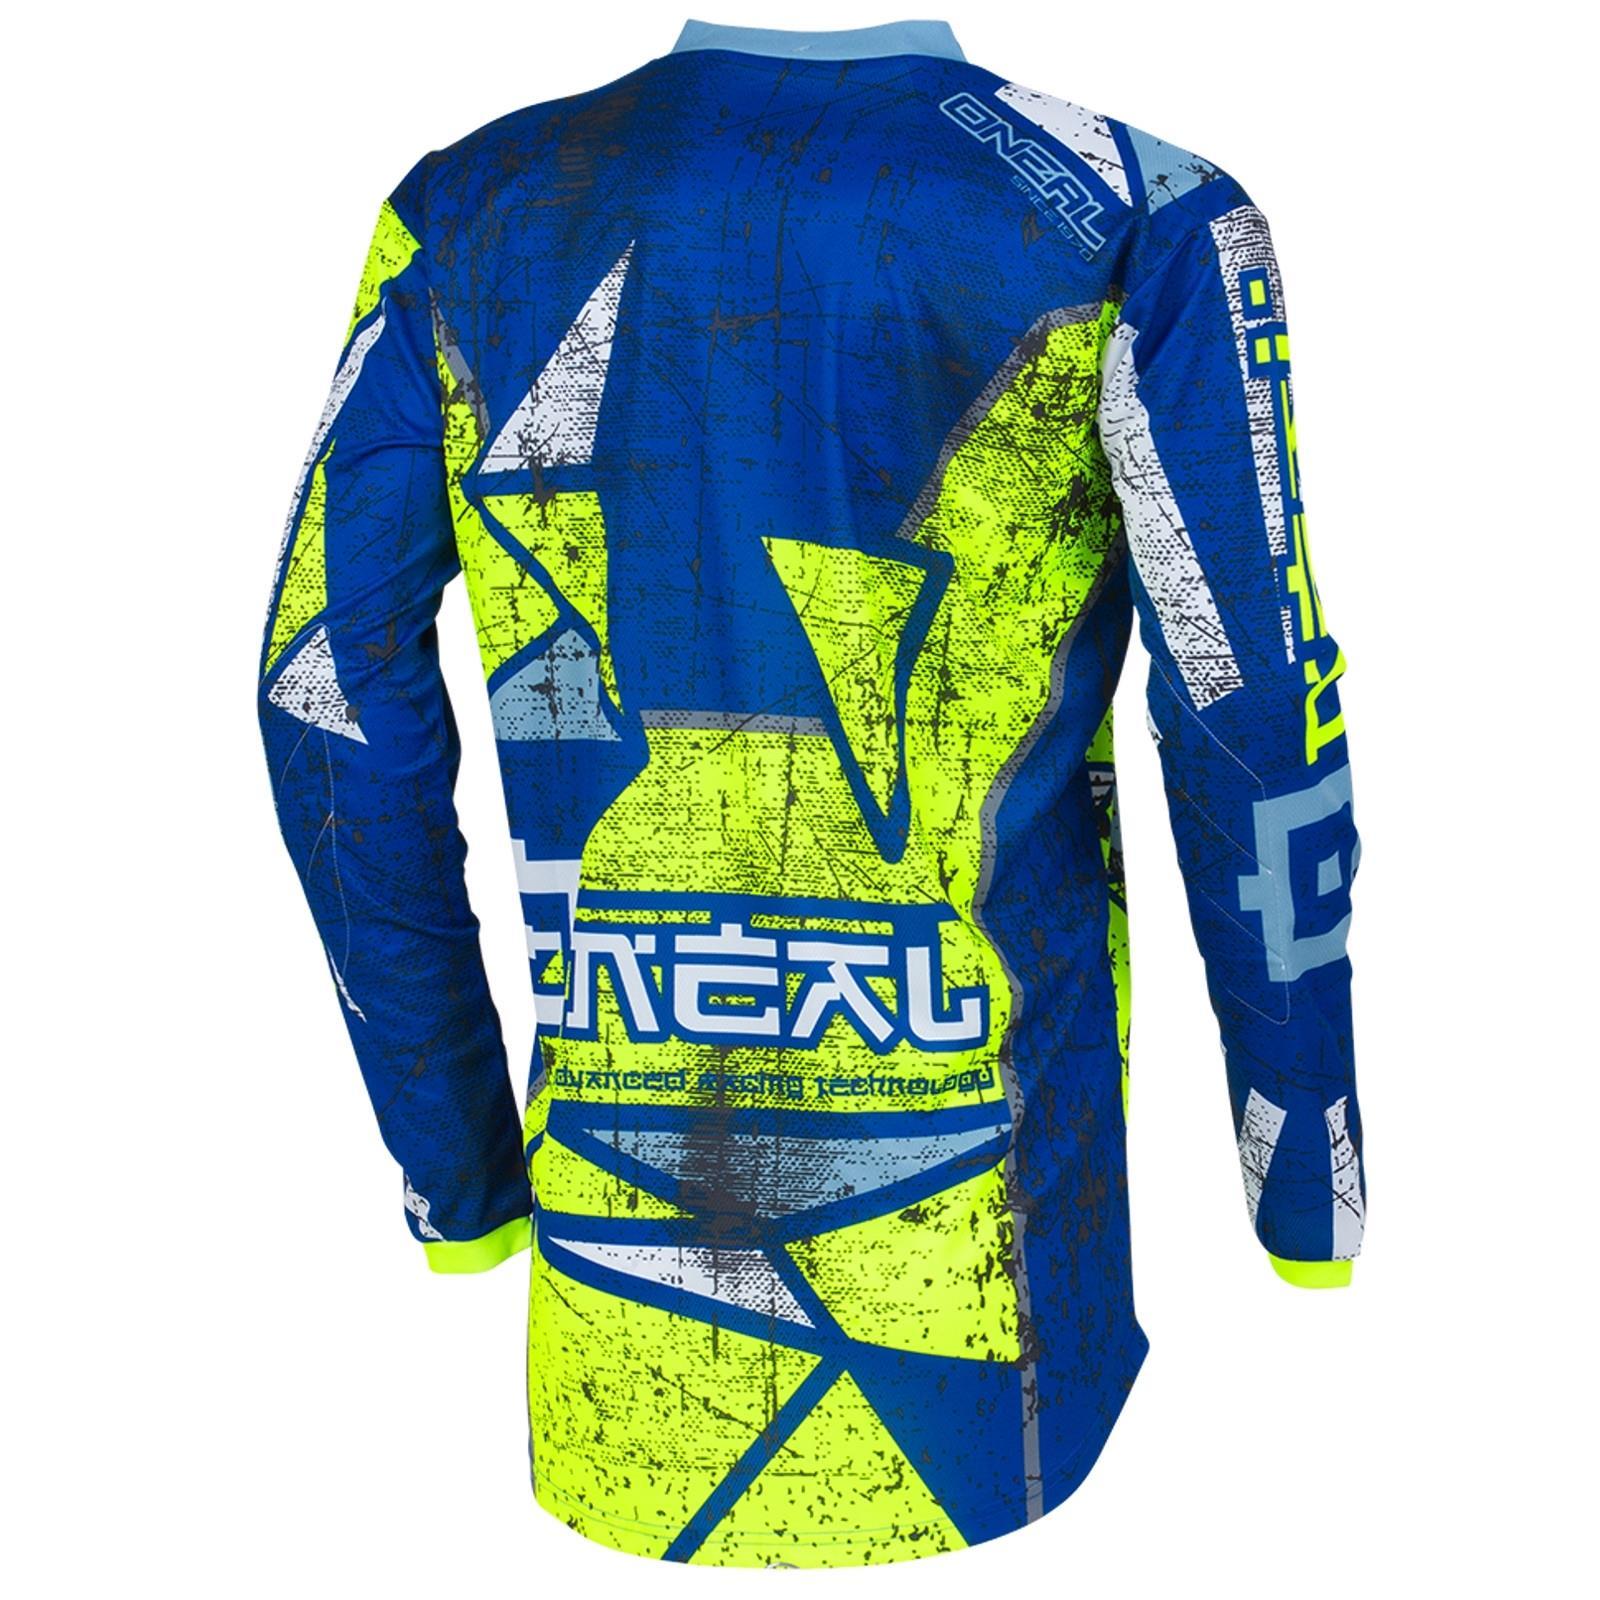 O-039-Neal-elemento-Mayhem-JERSEY-Racewear-Motocross-Maglia-MX-DH-FR-MTB-MOUNTAIN-BIKE miniatura 40